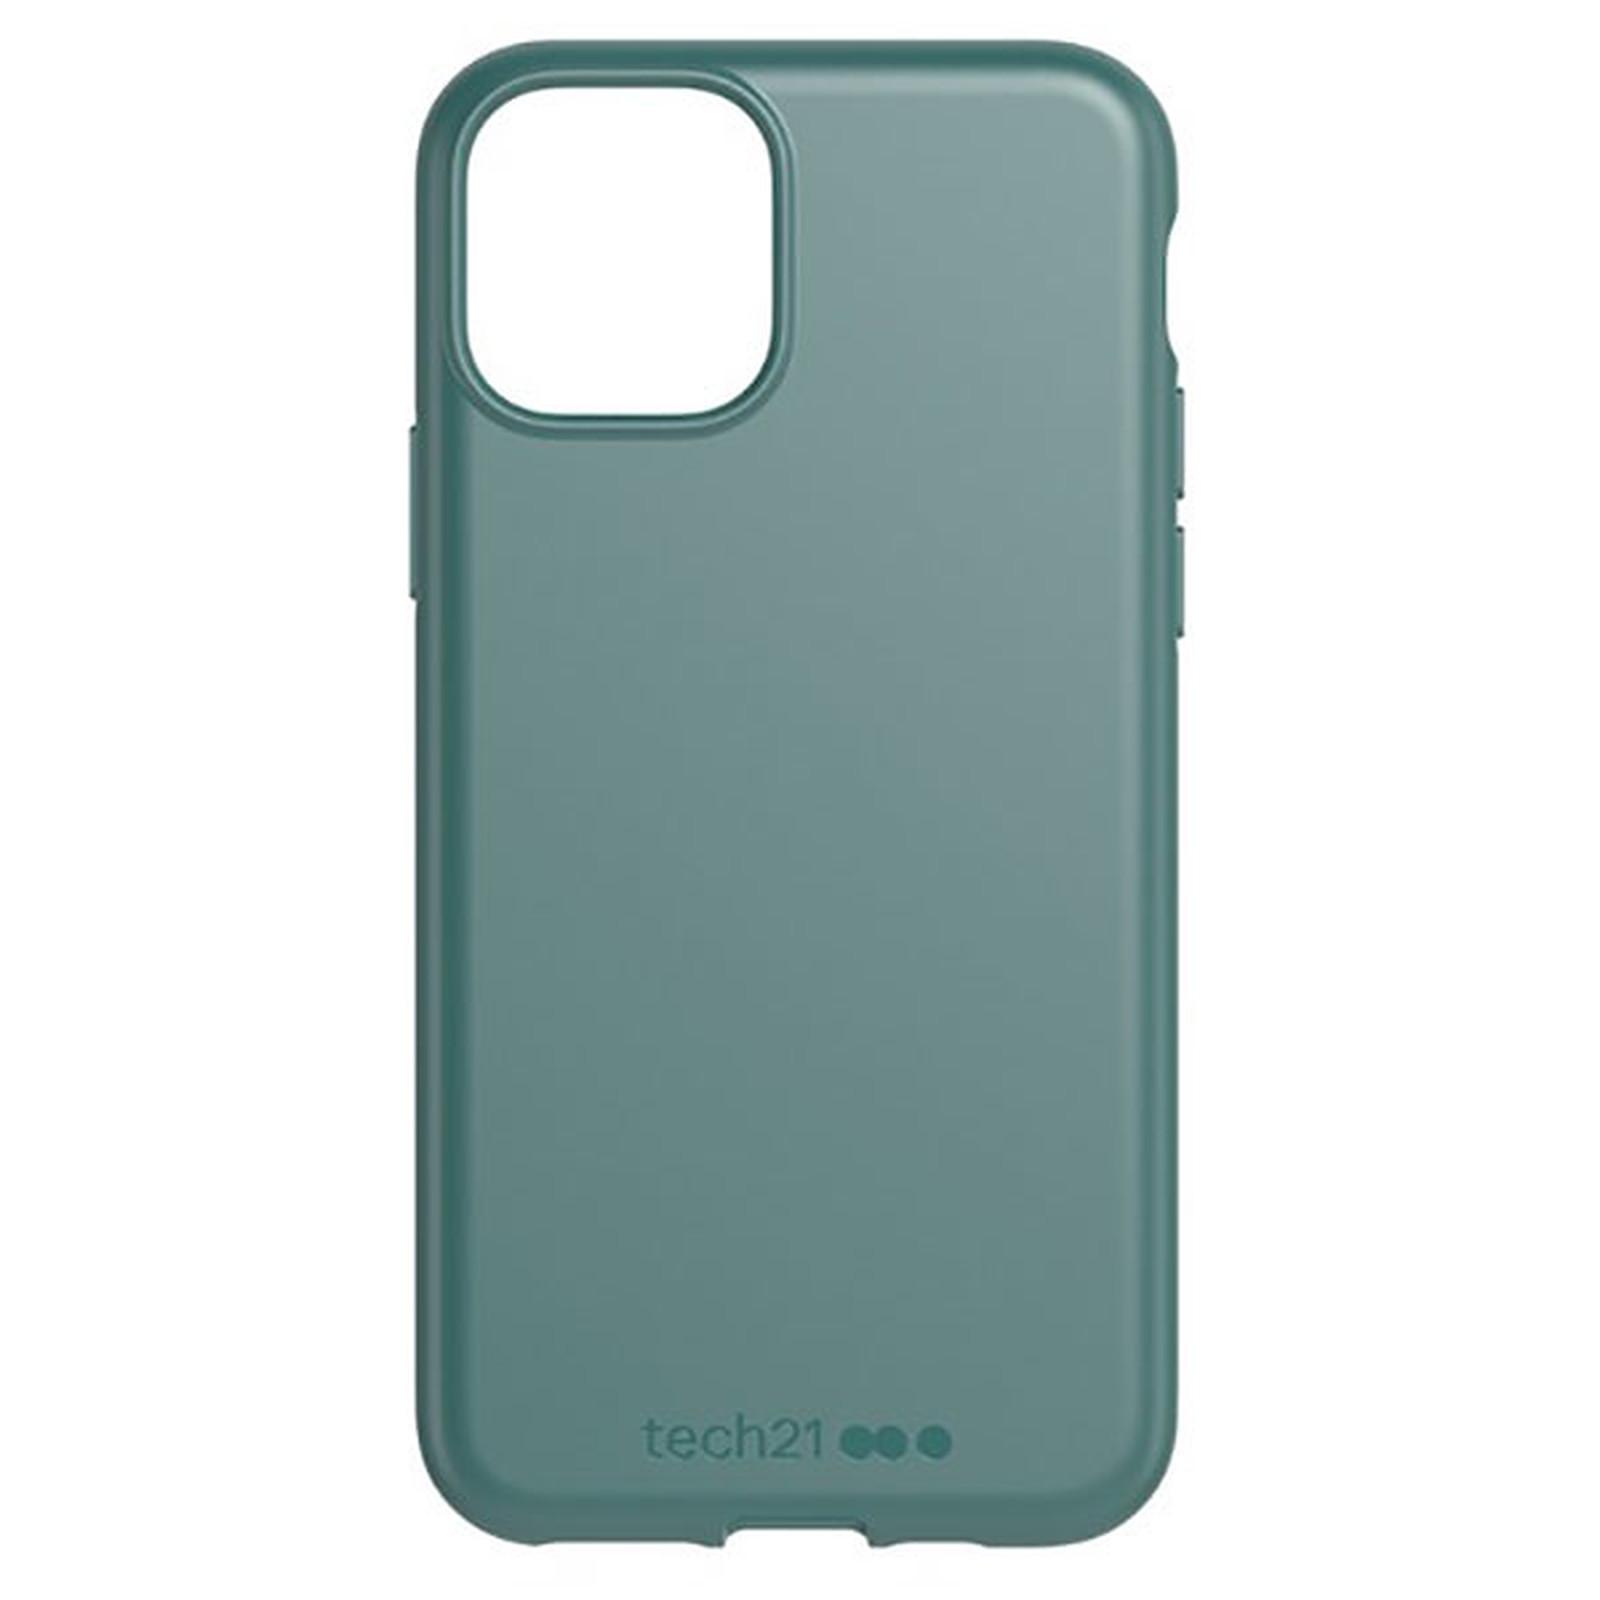 Tech21 Studio Colour Vert Apple iPhone 11 Pro